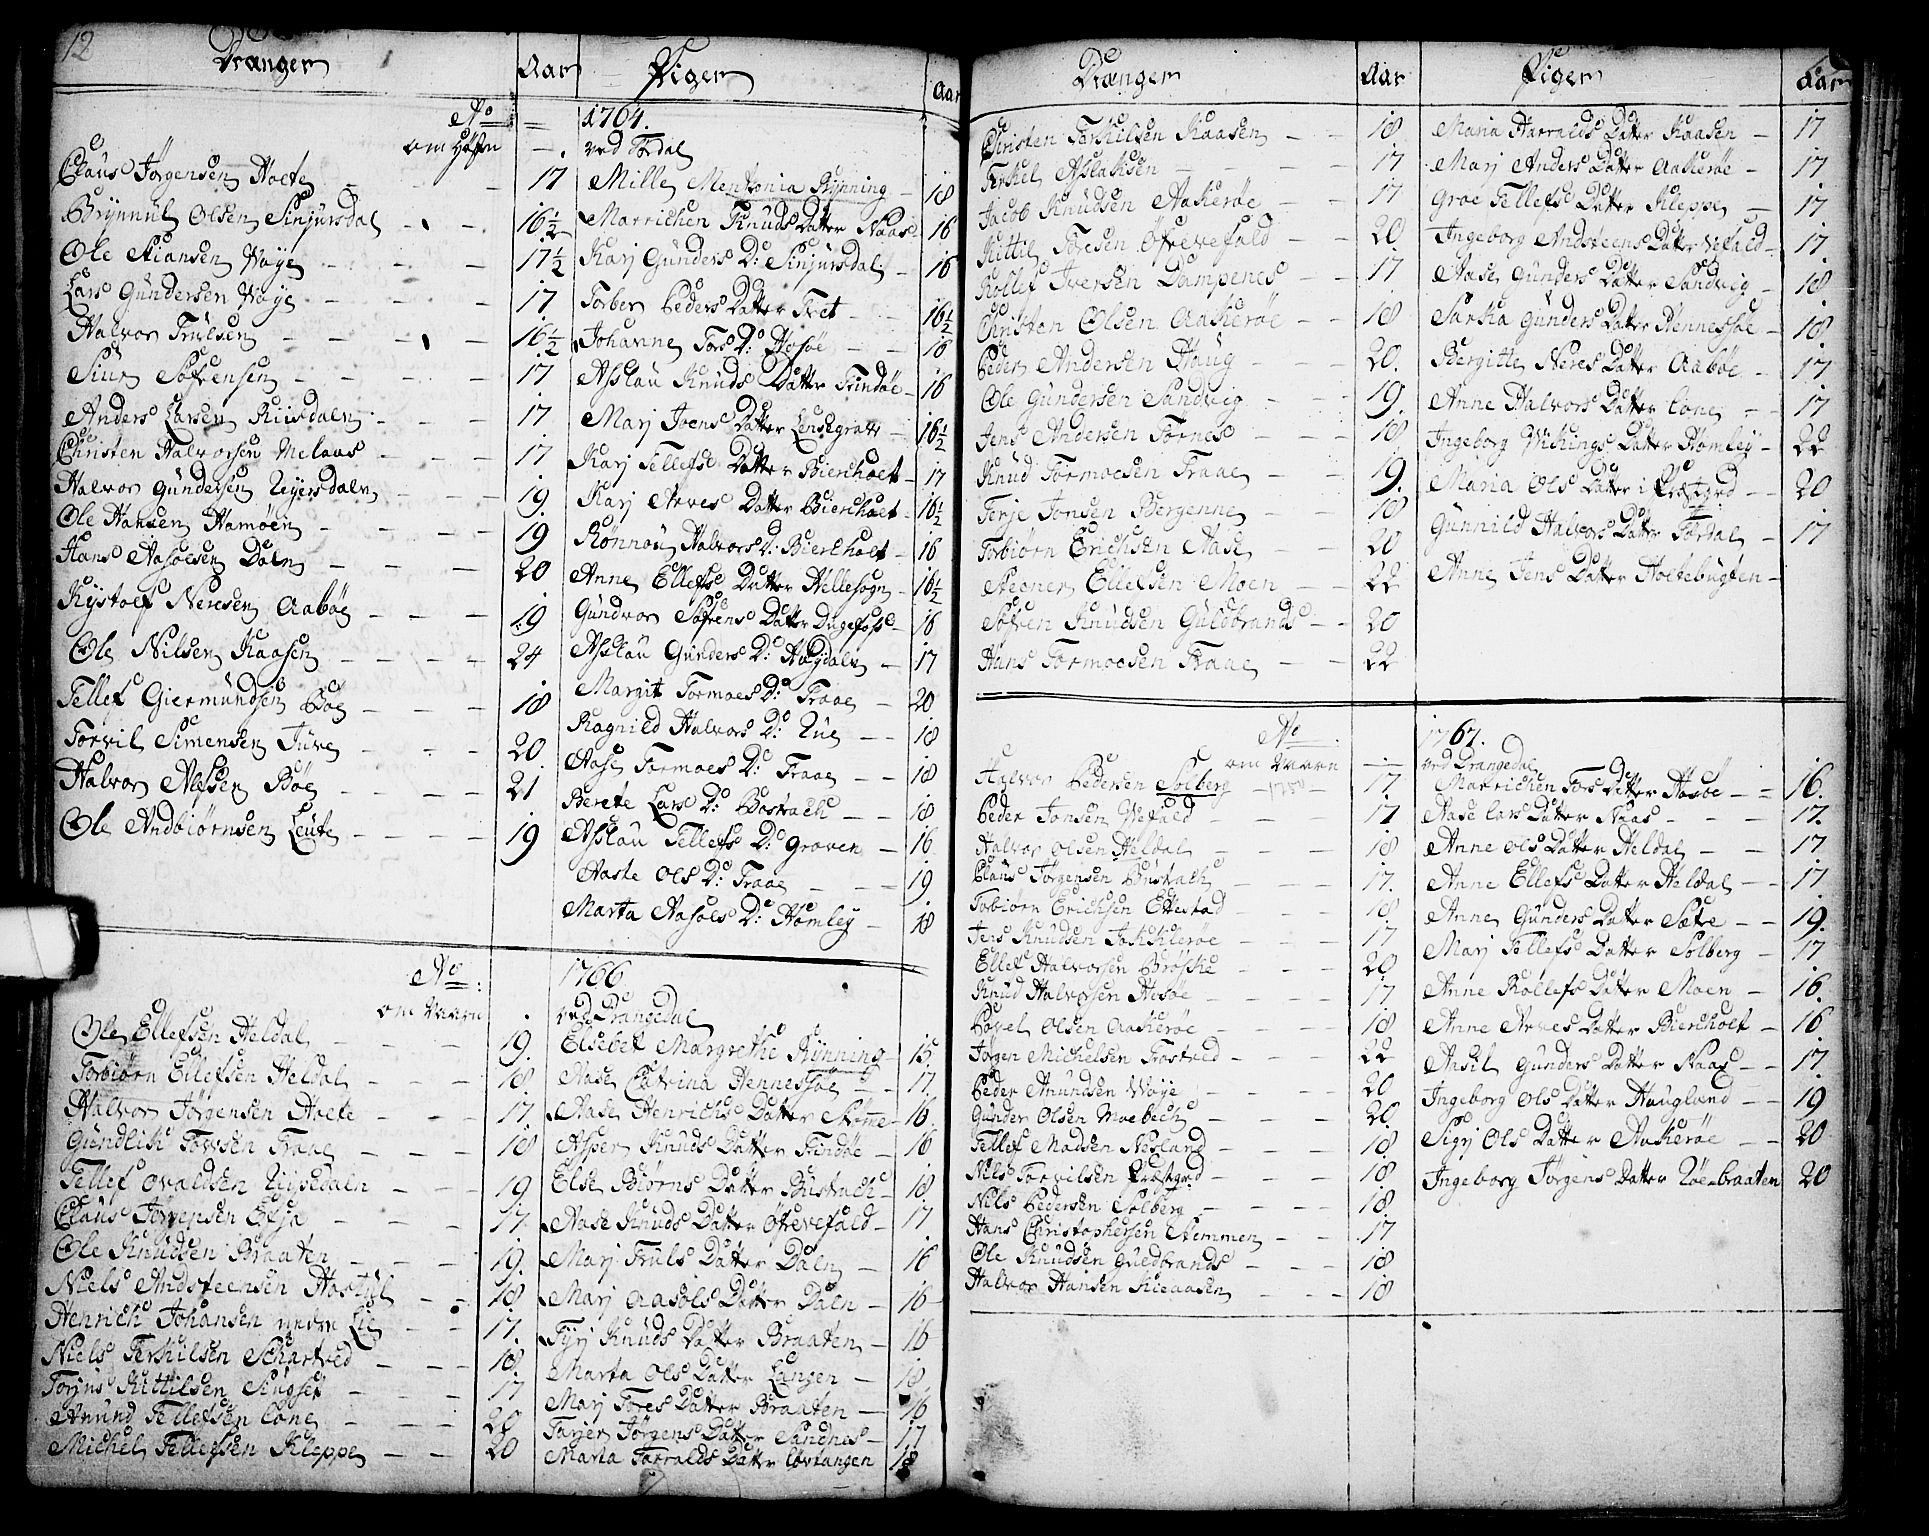 SAKO, Drangedal kirkebøker, F/Fa/L0001: Ministerialbok nr. 1, 1697-1767, s. 12-13